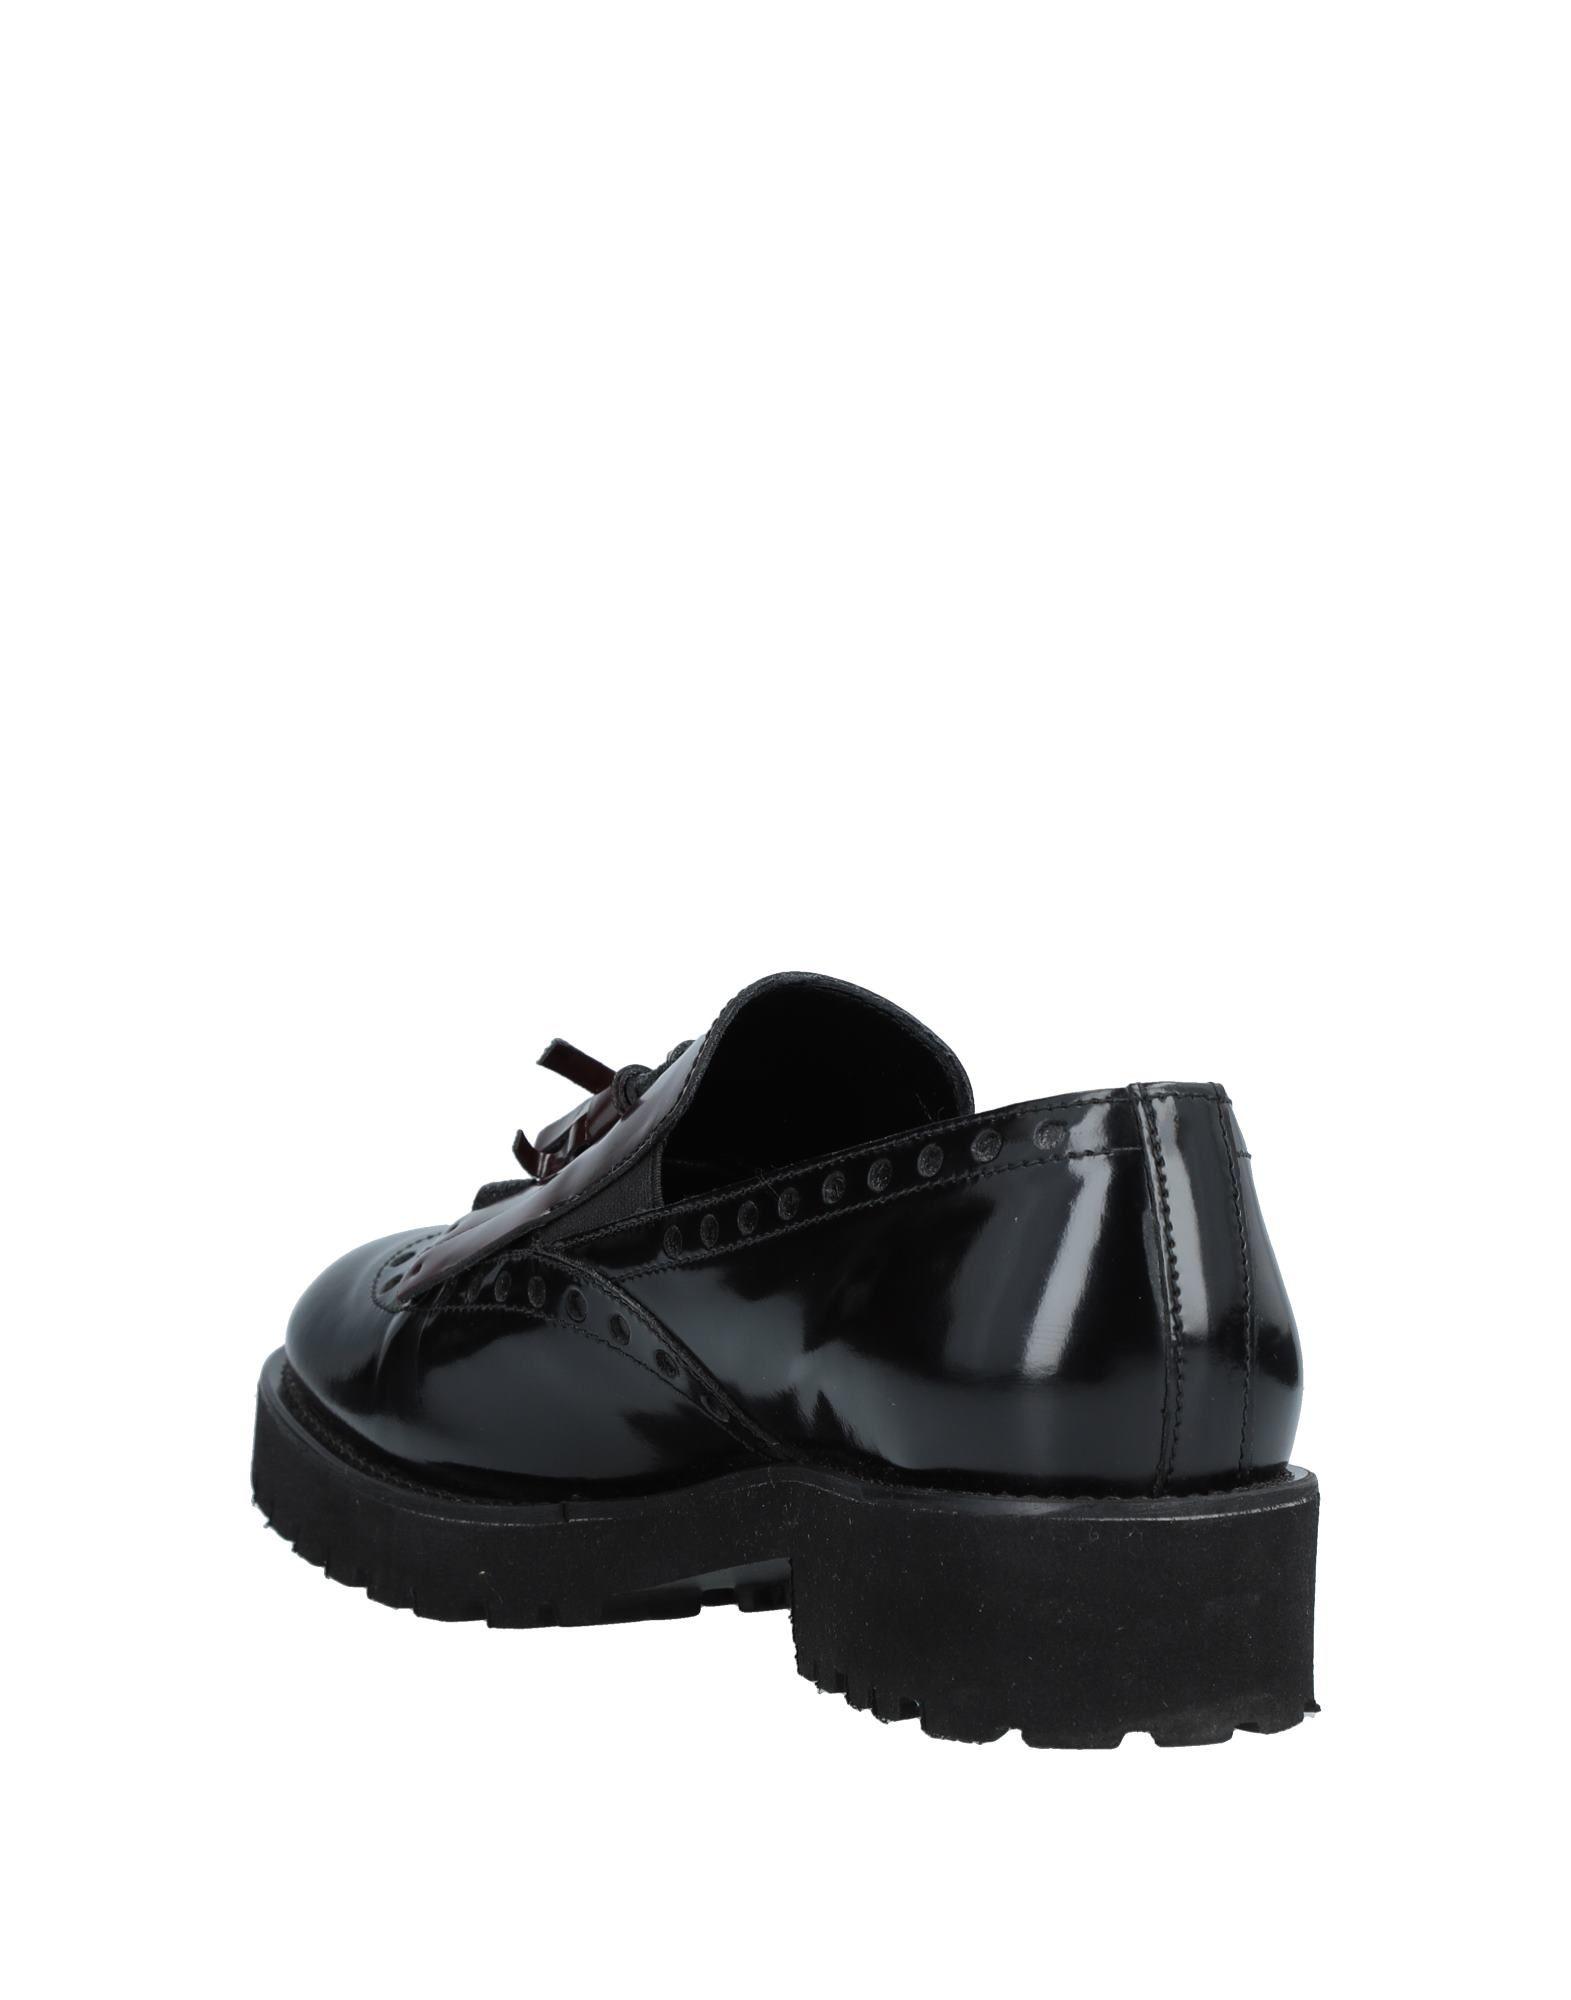 Stilvolle billige Schuhe Schuhe Schuhe Le Ble Mokassins Damen  11526500DS e99712